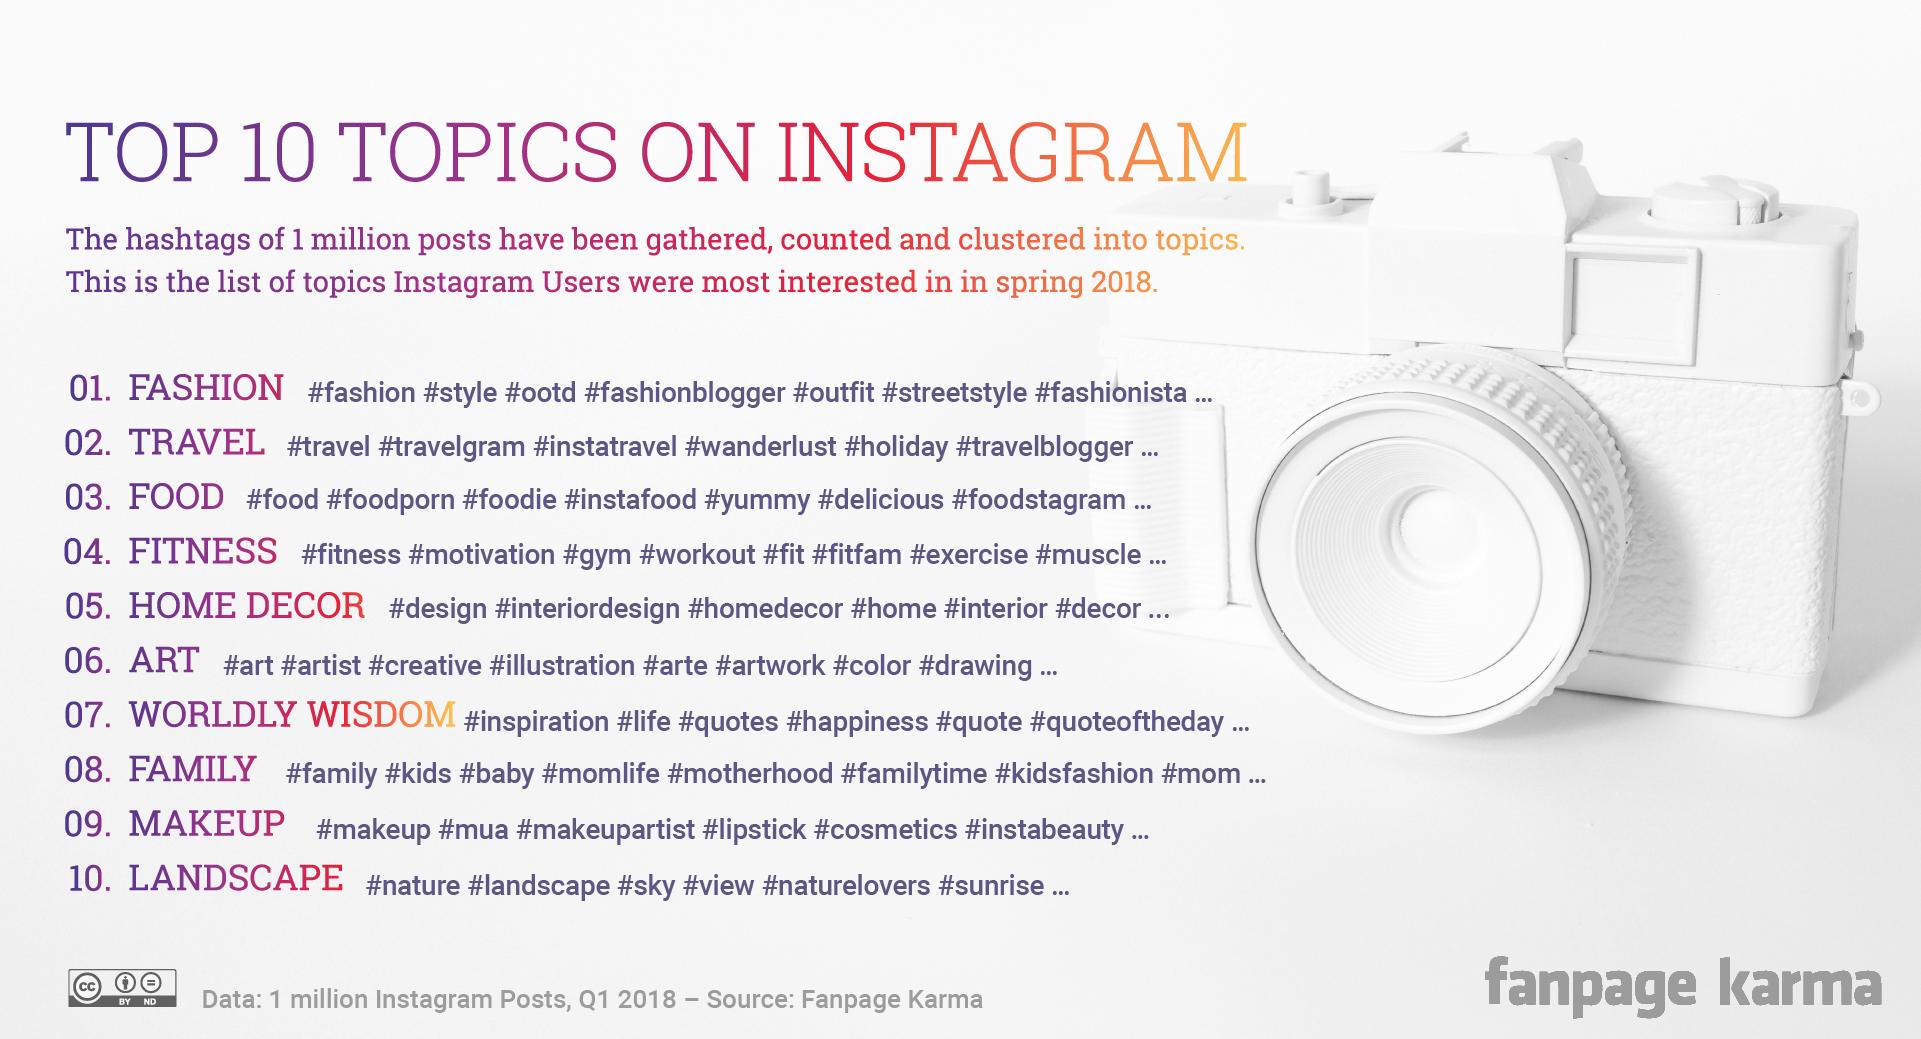 Top 10 Topics on Instagram - Fanpage Karma Blog